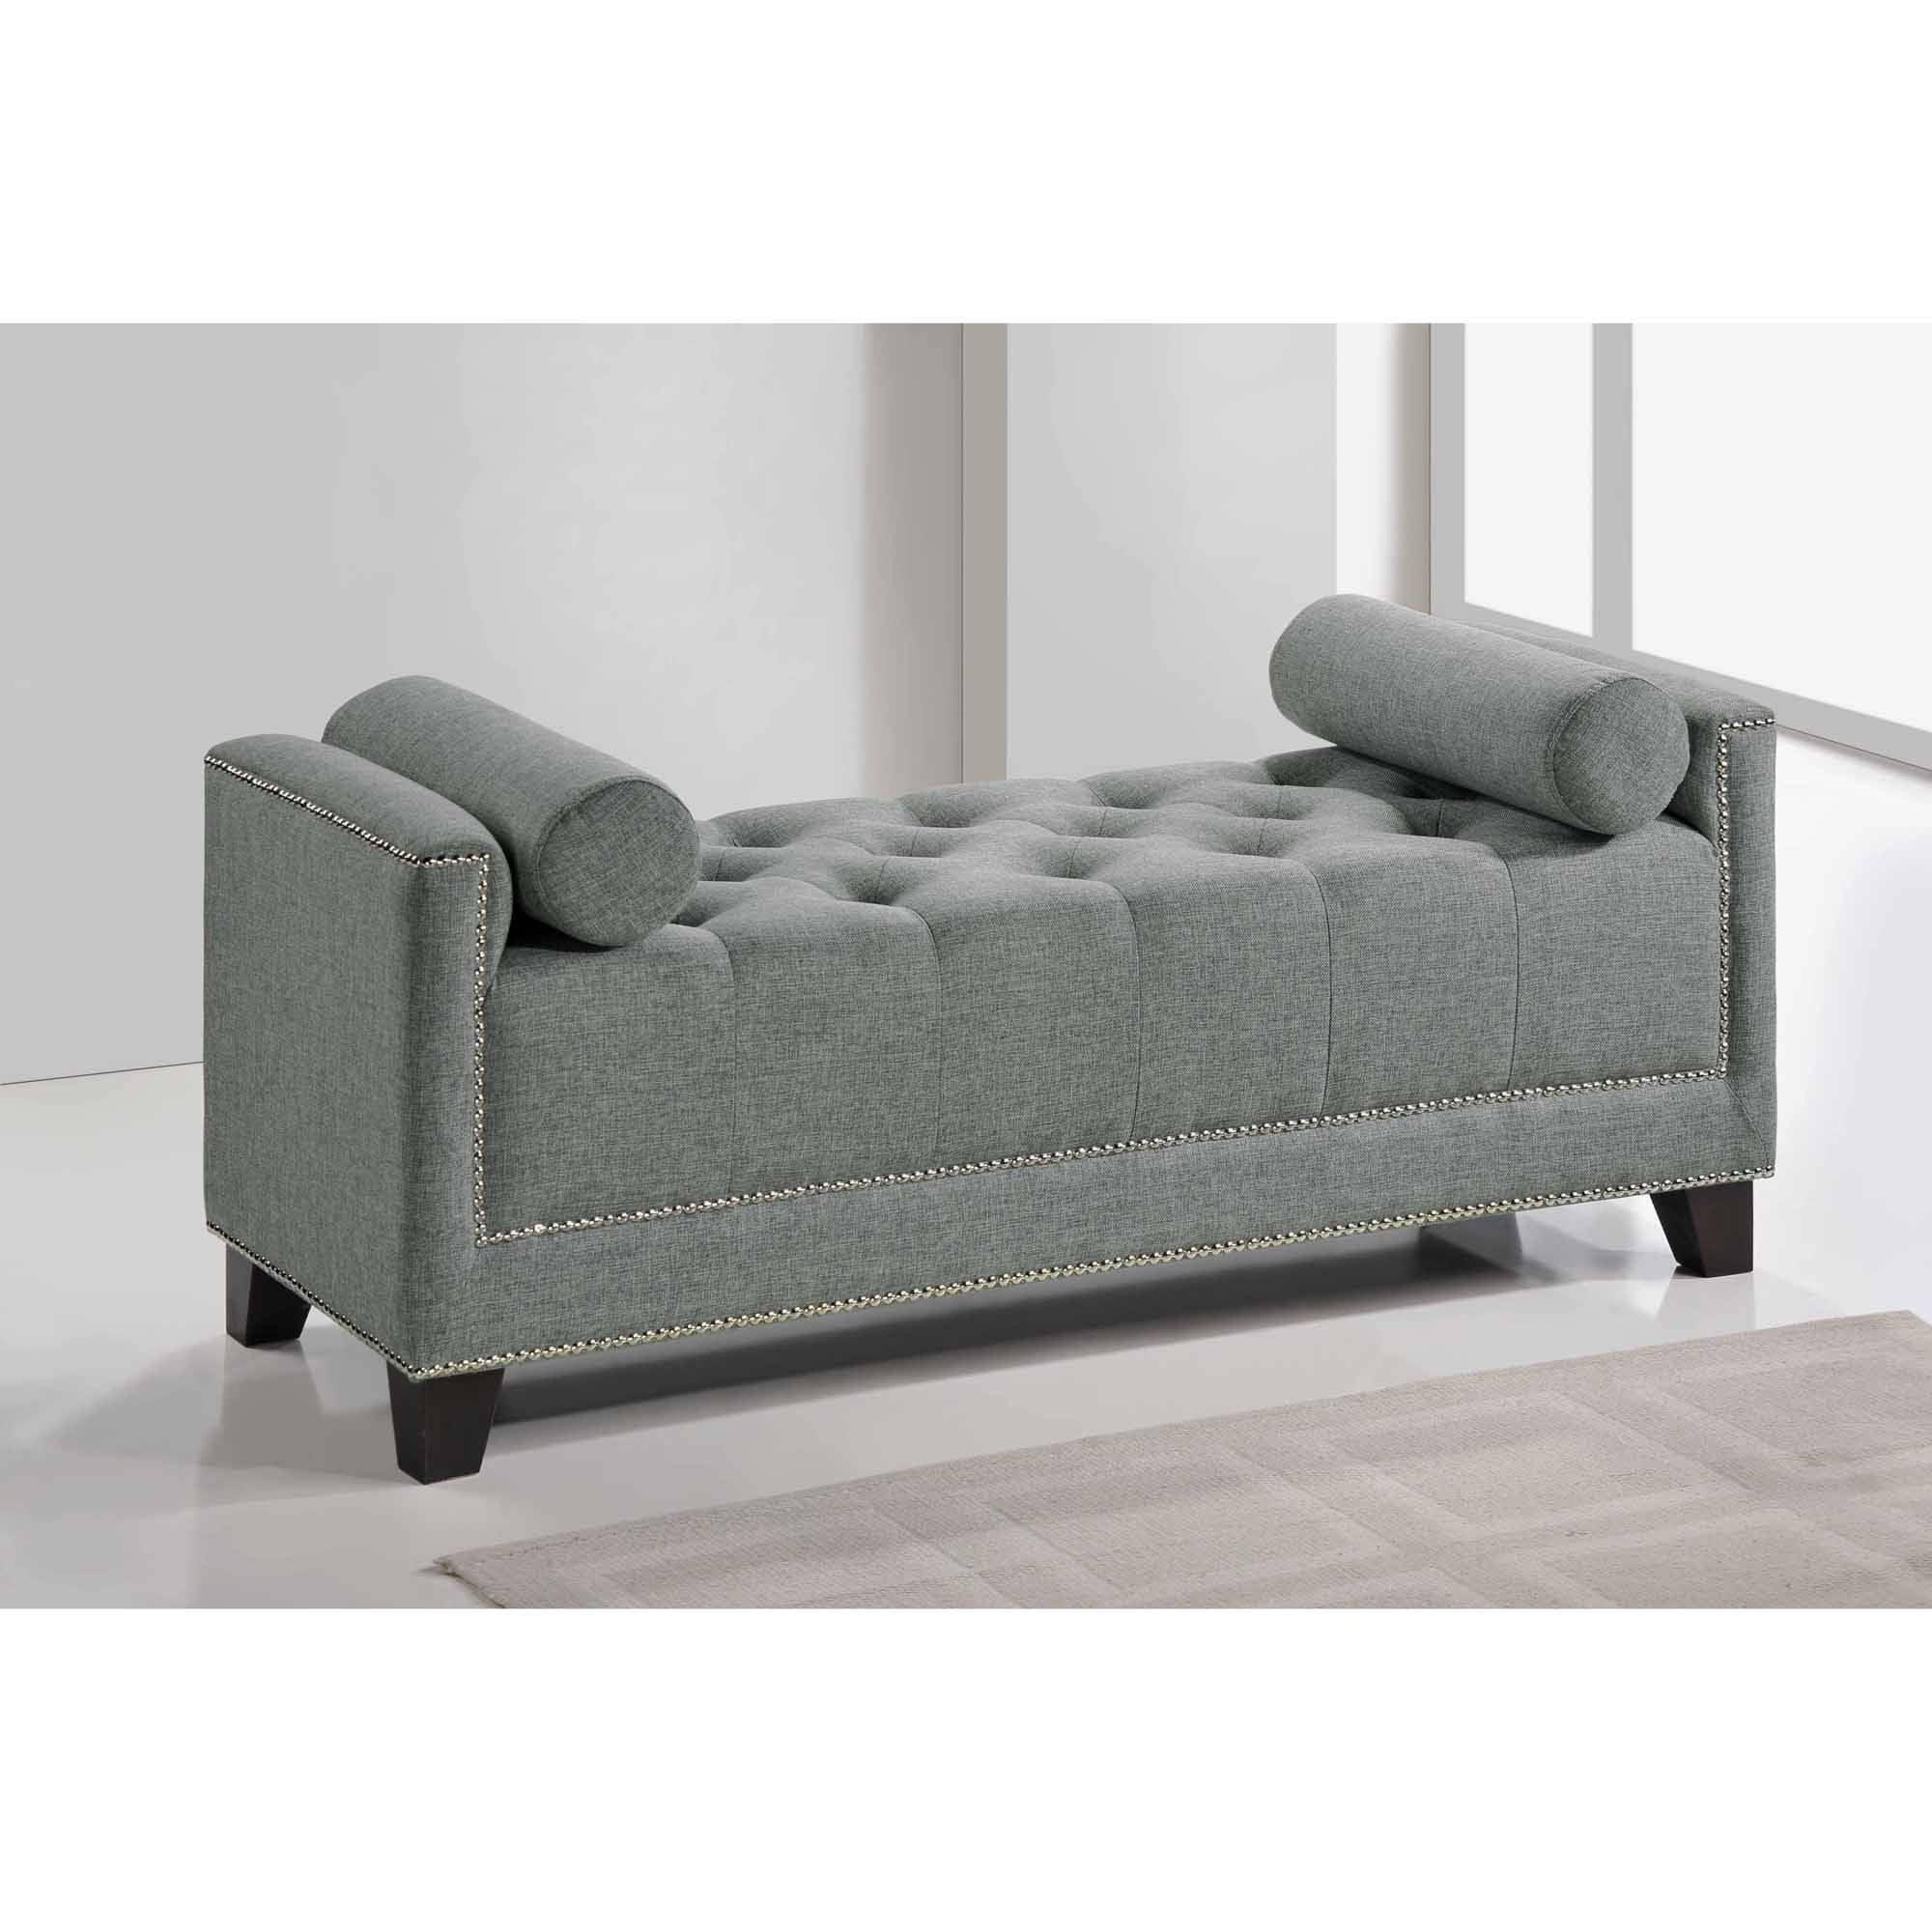 Baxton Studio Hirst Grey Bedroom Bench Walmart